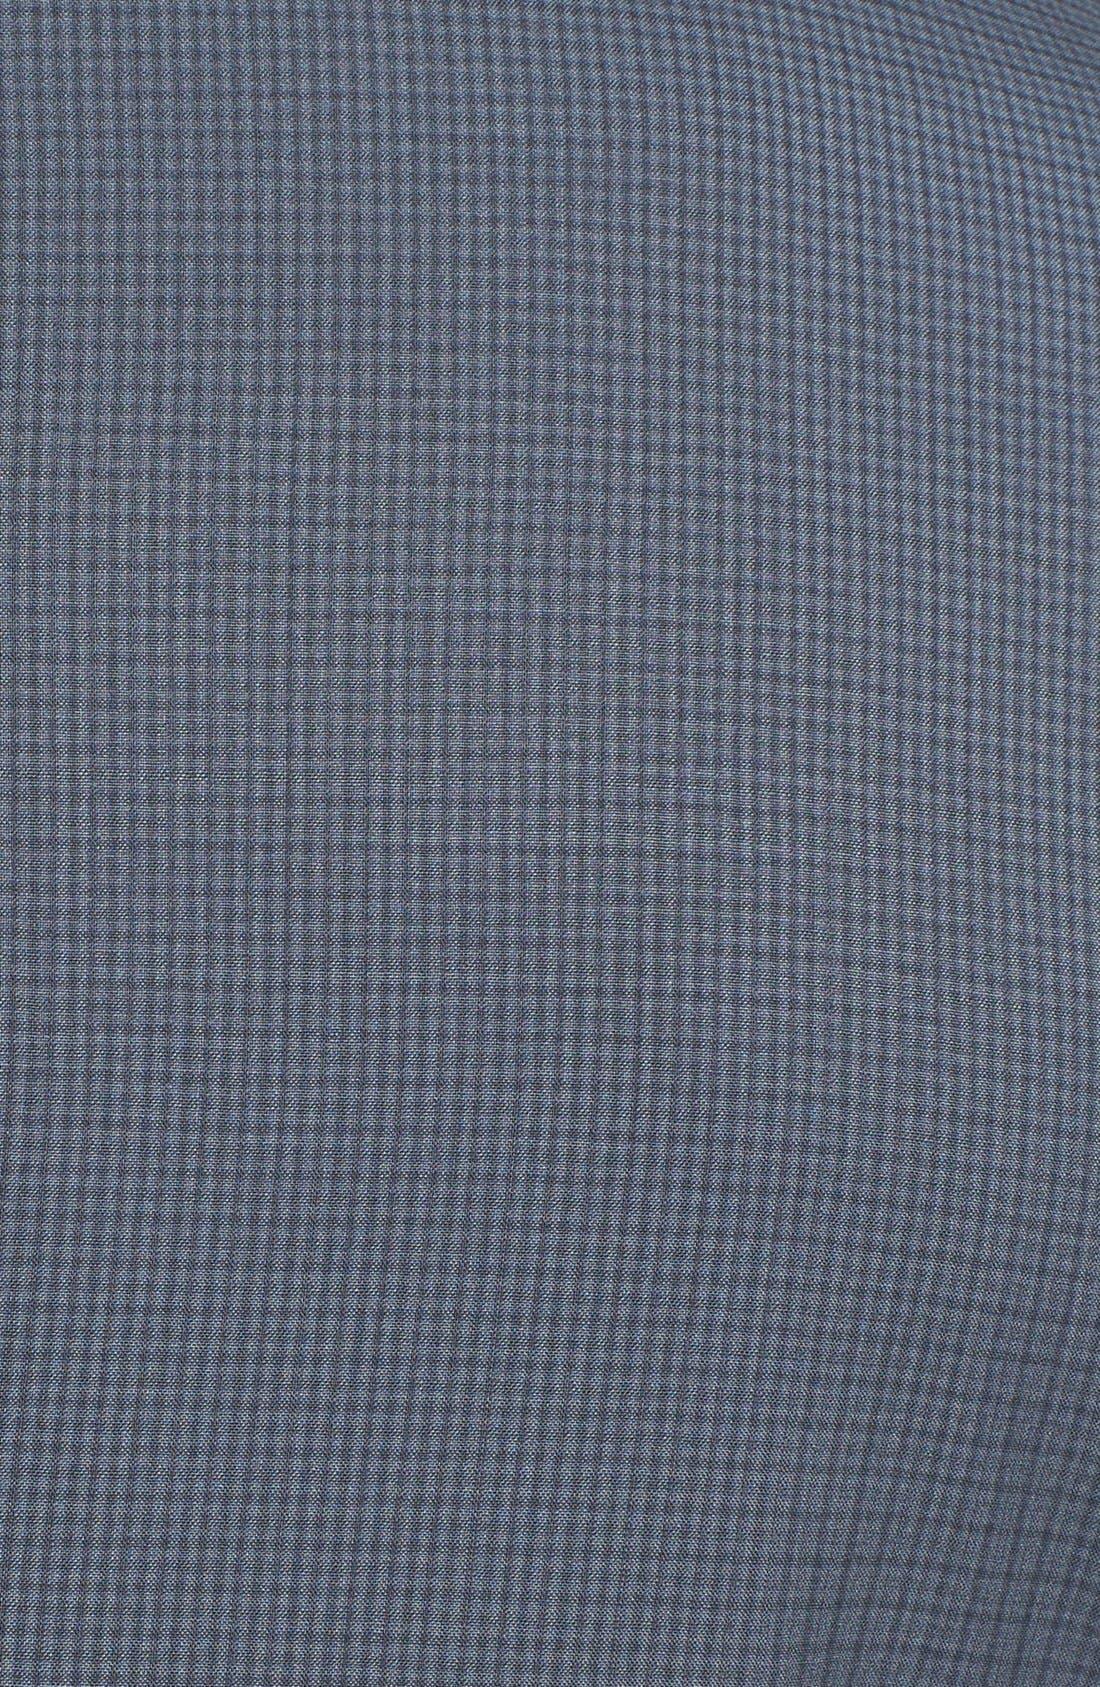 Alternate Image 5  - Ted Baker London 'Jones' Trim Fit Check Suit (Online Only)